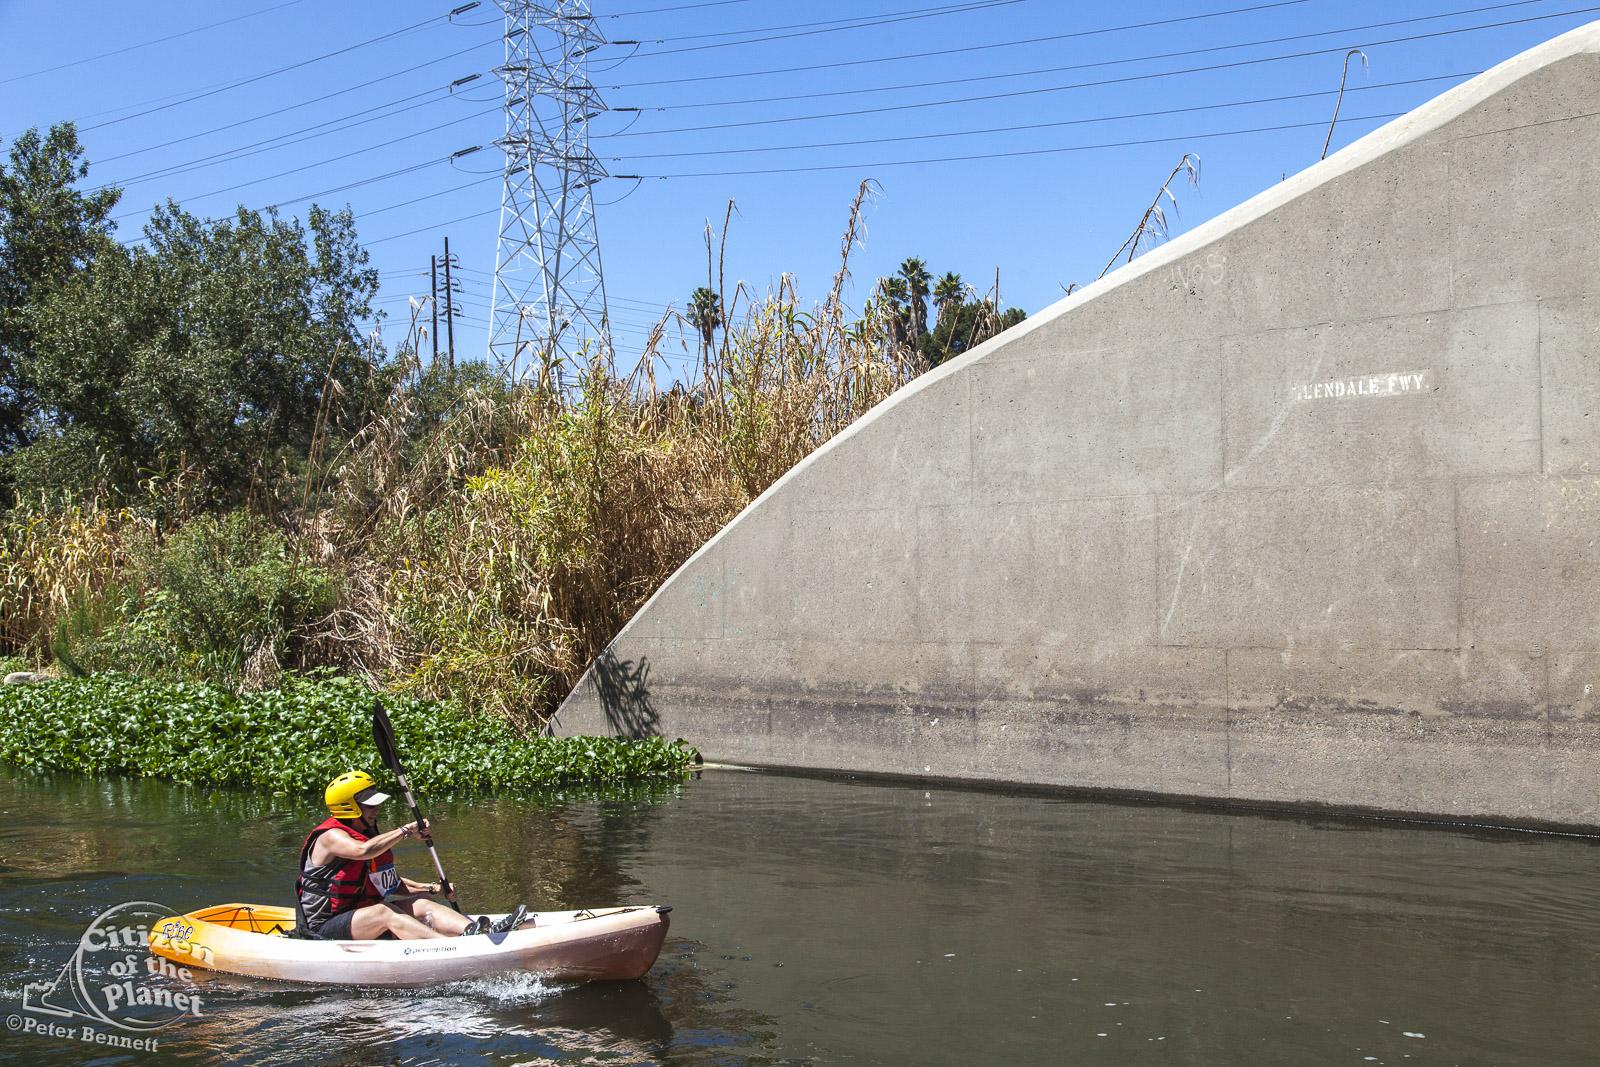 US_CA_48_3885_la_river_boat_race.jpg